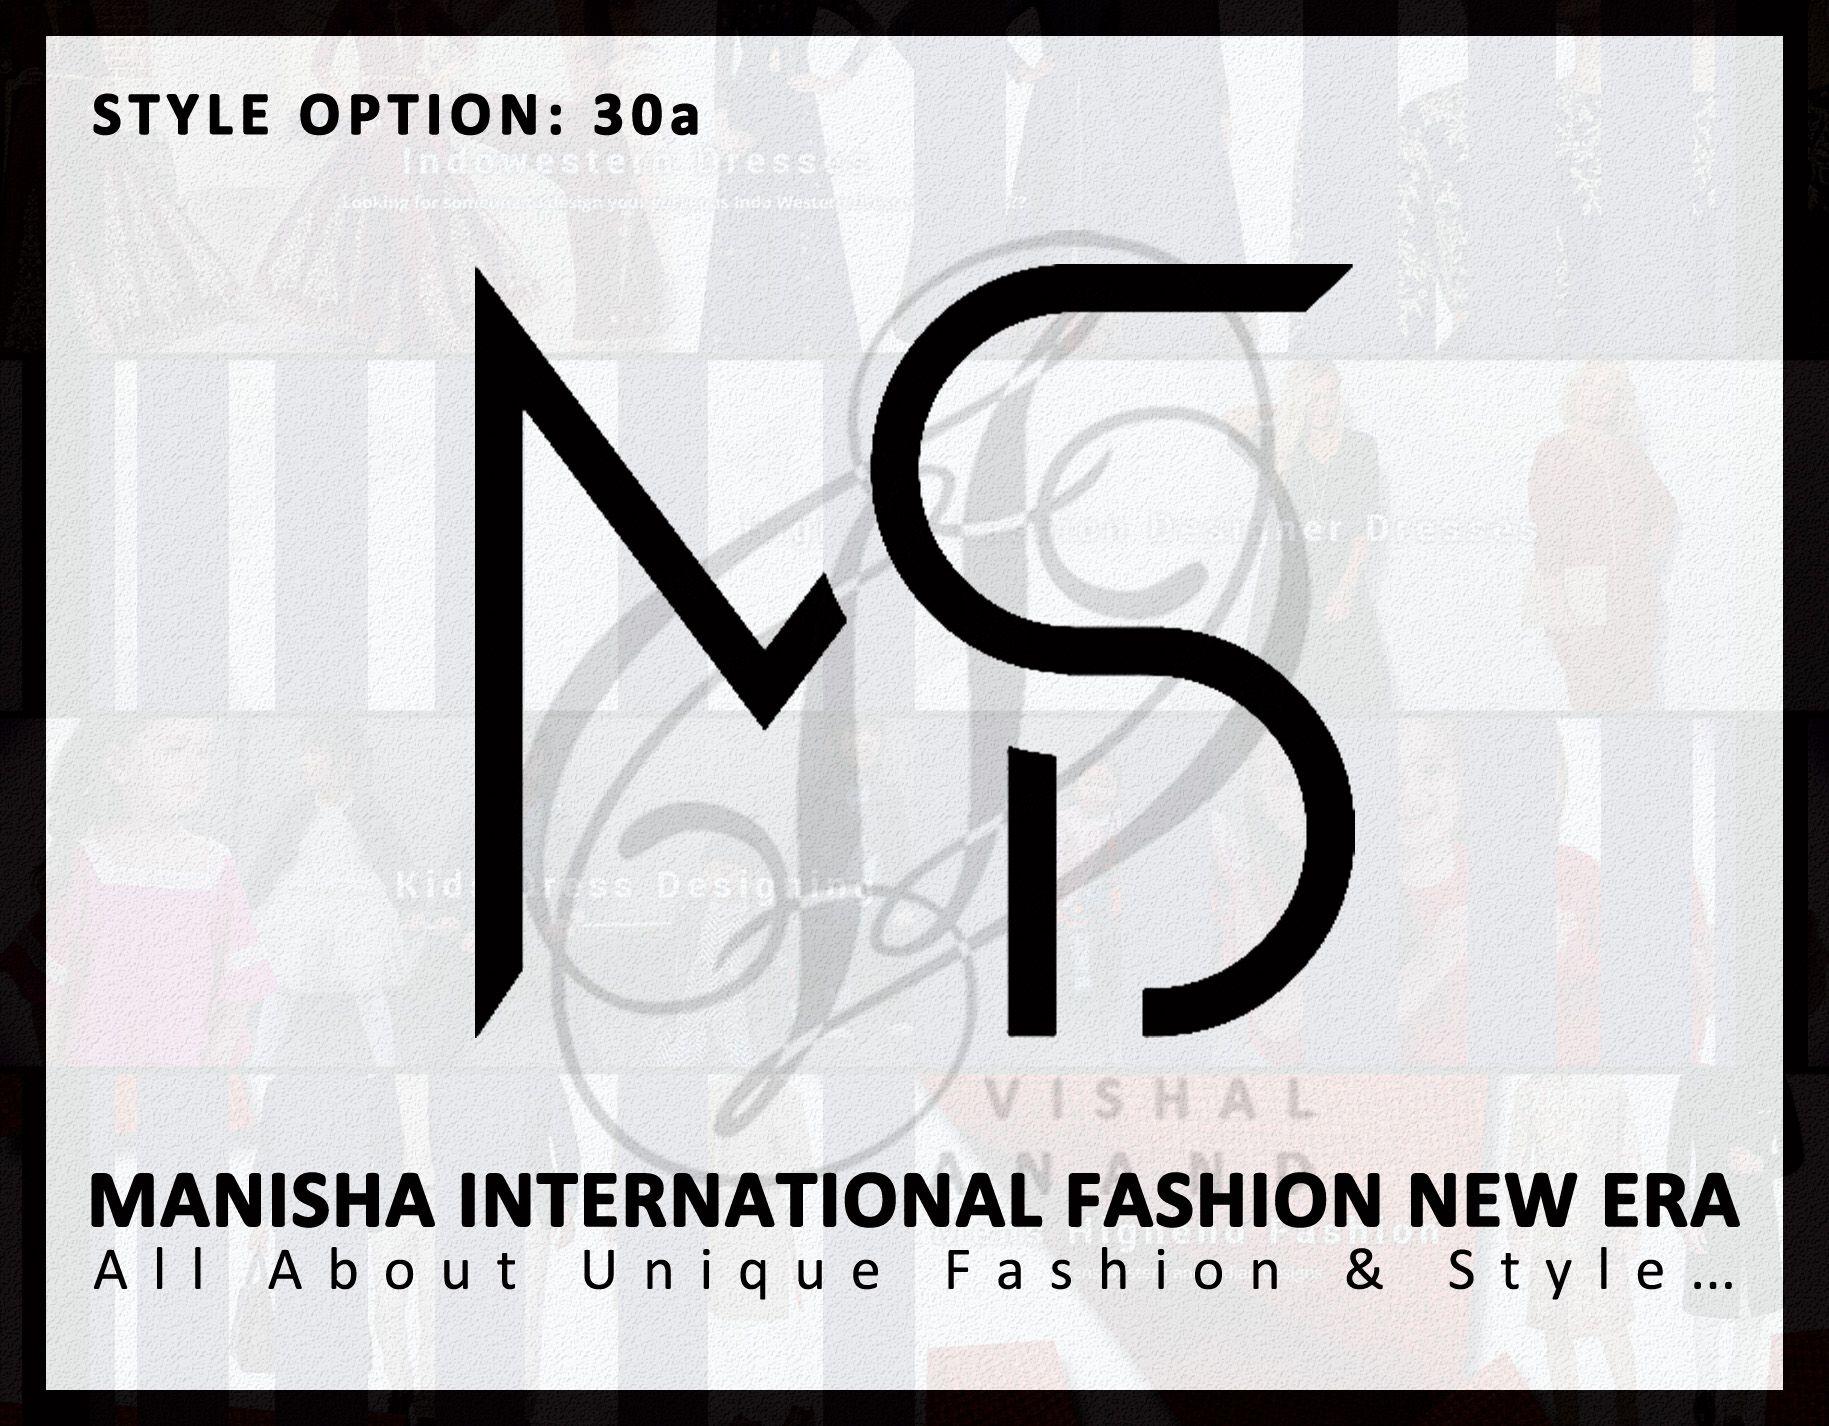 Pin By Vishal Anand On Logo Designs For Manisha International